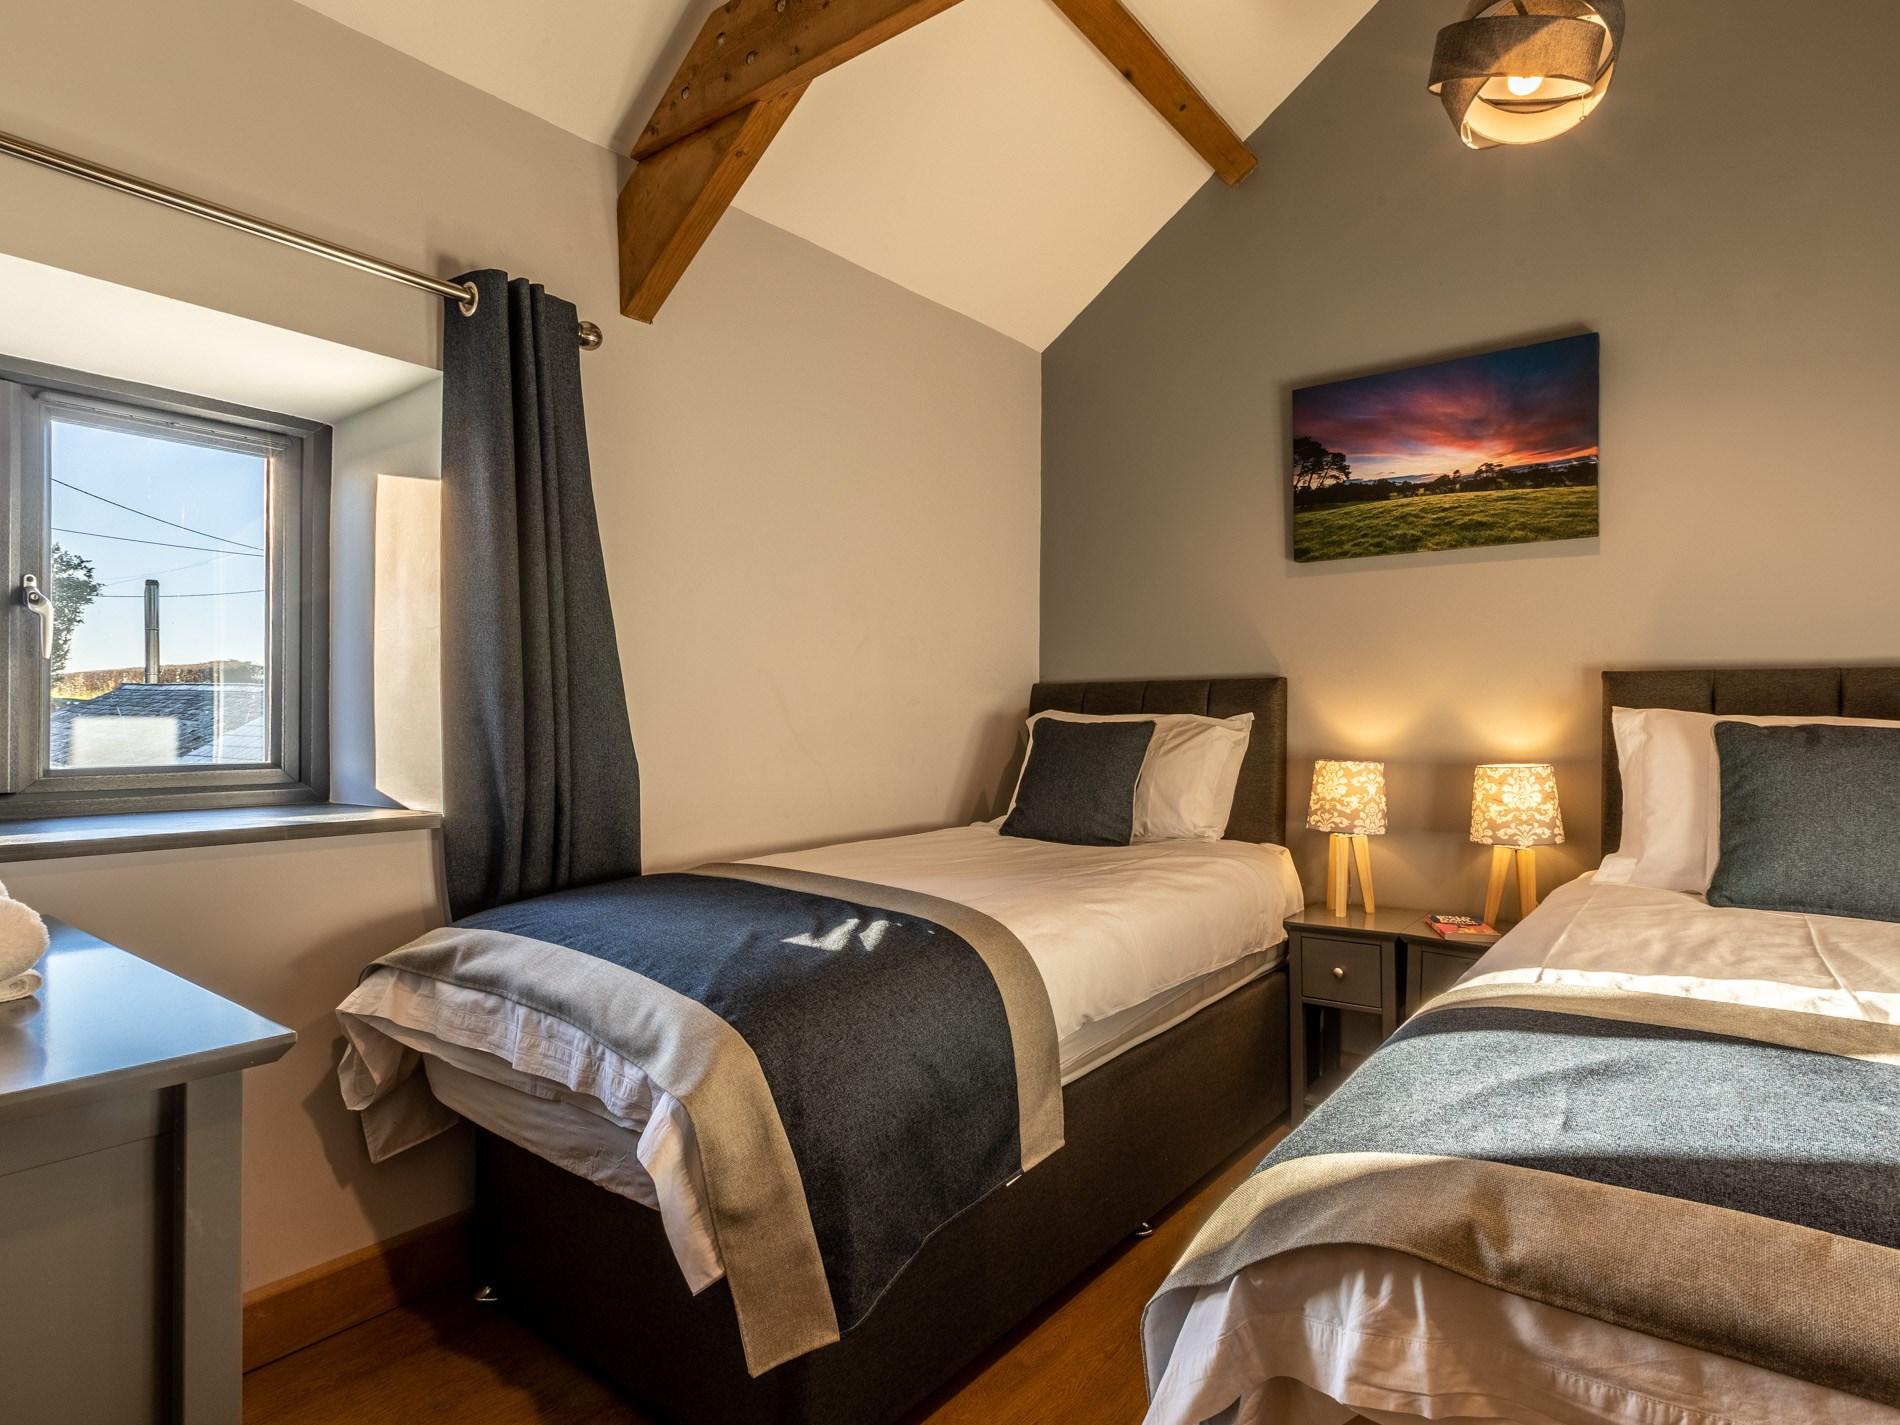 5 Bedroom Cottage in Holsworthy, Devon